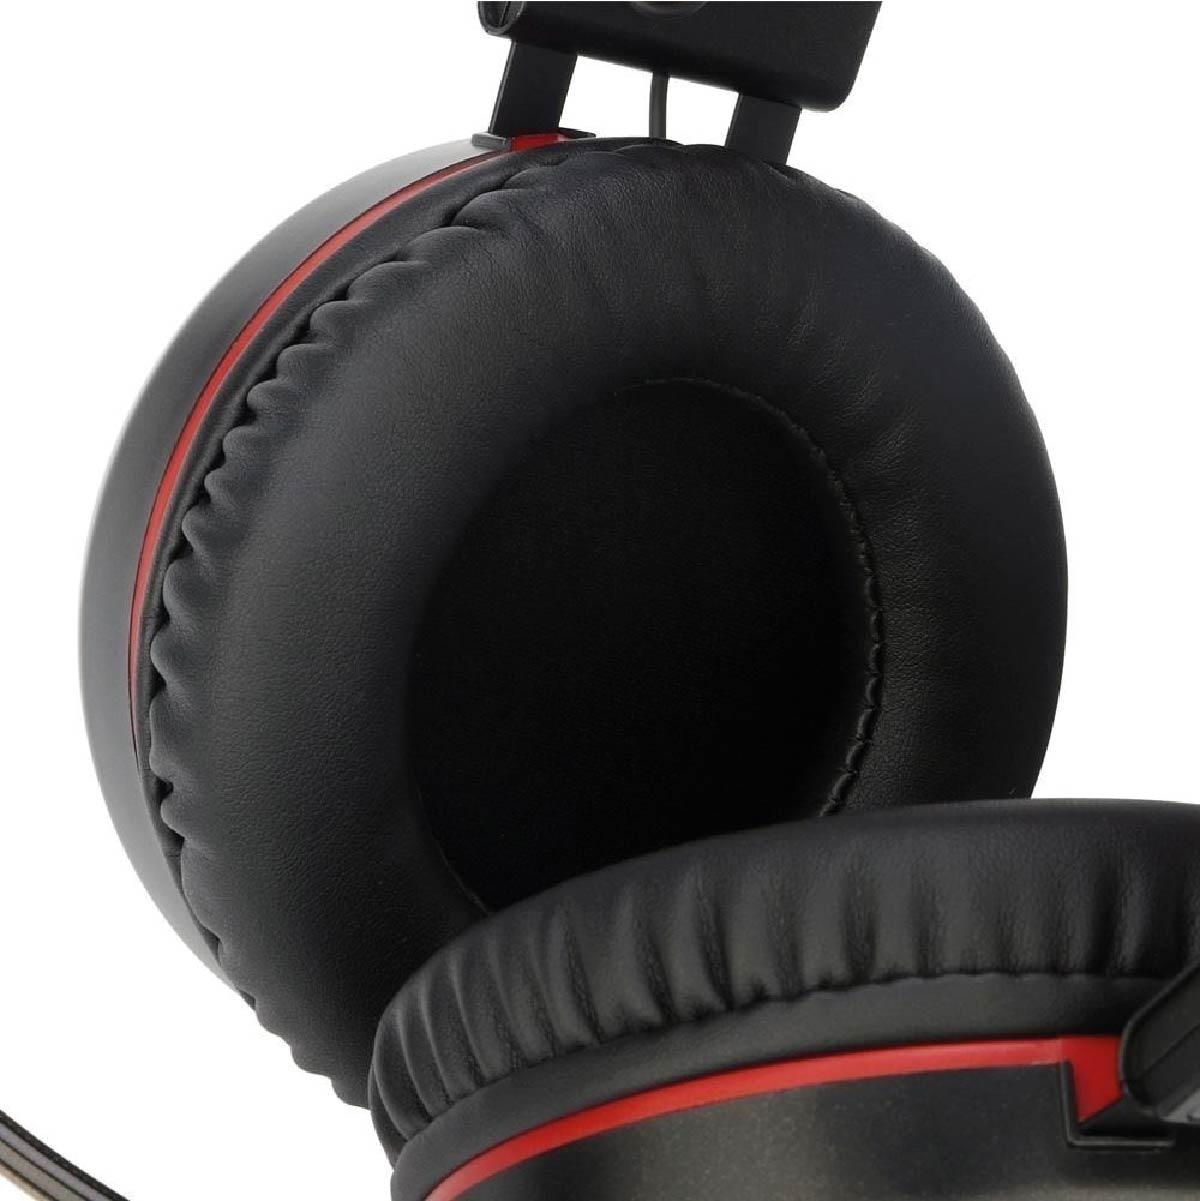 Headset Fone de Ouvido Redragon H210 Minos Surround 7.1 Profissional Gamer